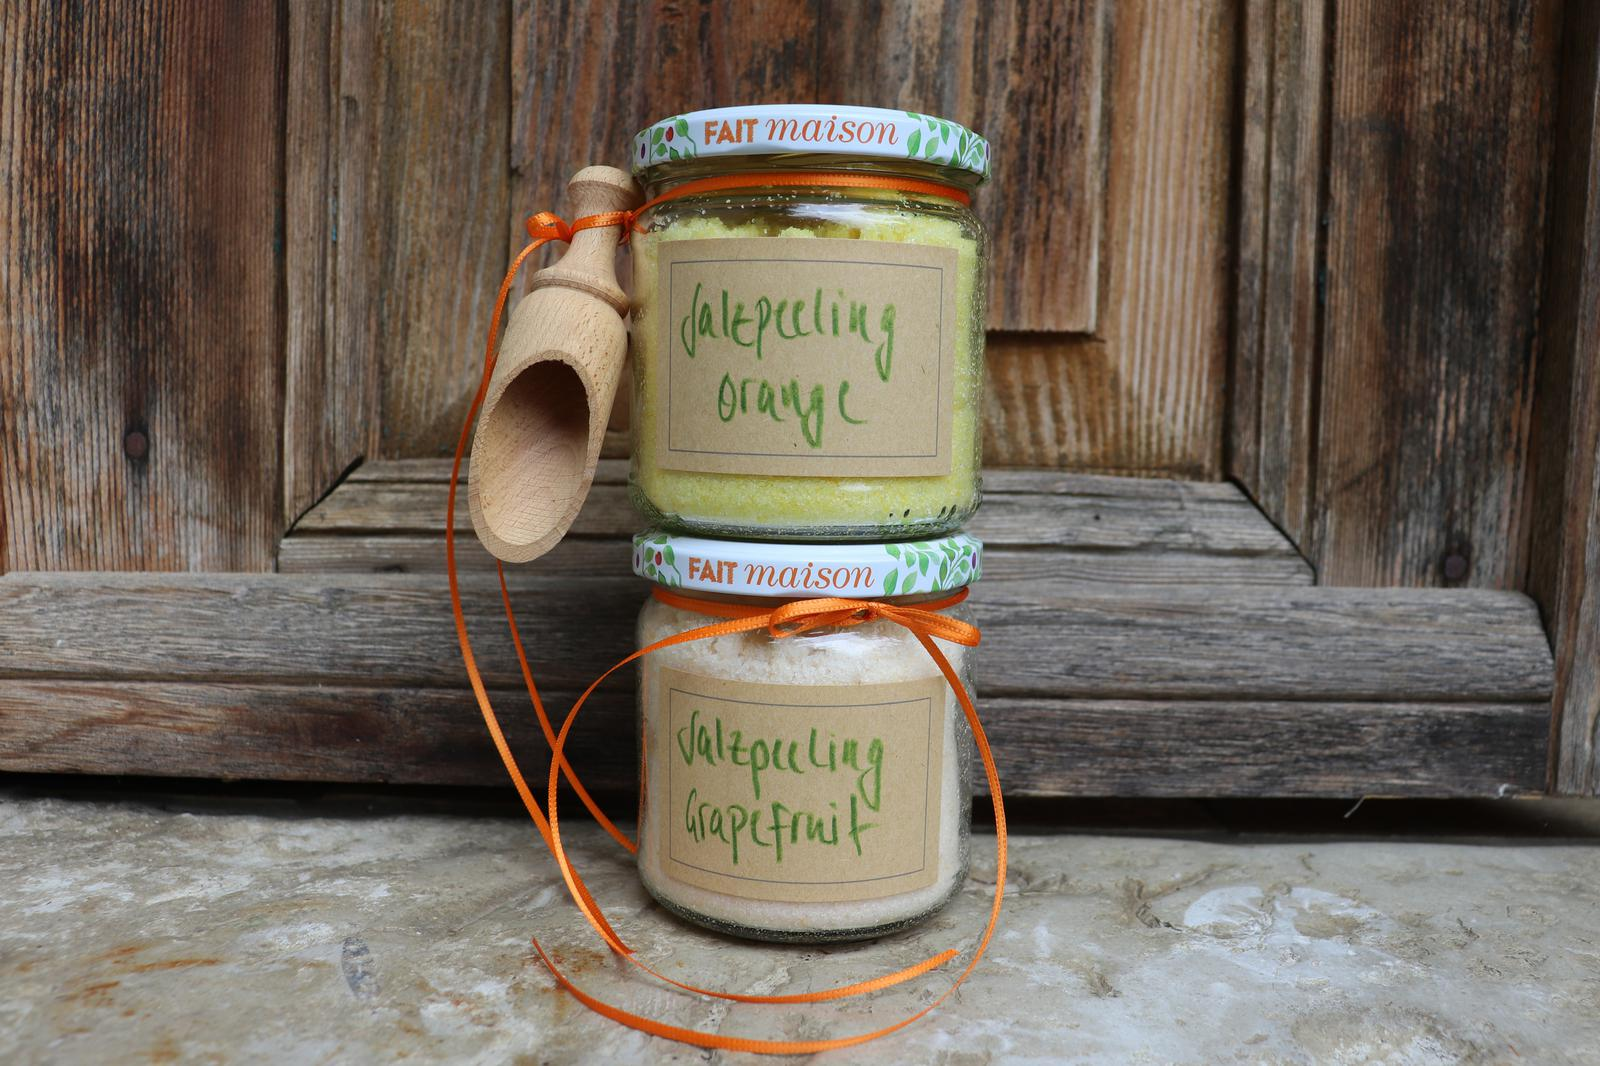 Selbstgemachte Salzpeelings|Salzpeelings|Naturkosmetik|DIY|Orangenpeeling|Grapefruitpeeling|Orangen-Salzpeeling|Grapefruit-Salzpeeling|kleine Geschenke|DIY-Geschenke,ätherische Öle|Sauna-Salzpeeling|Saunasalz|Orangen-Saunasalz|Grapefruit-Saunasalz|Orange|Grapefruit|Pampelmuse